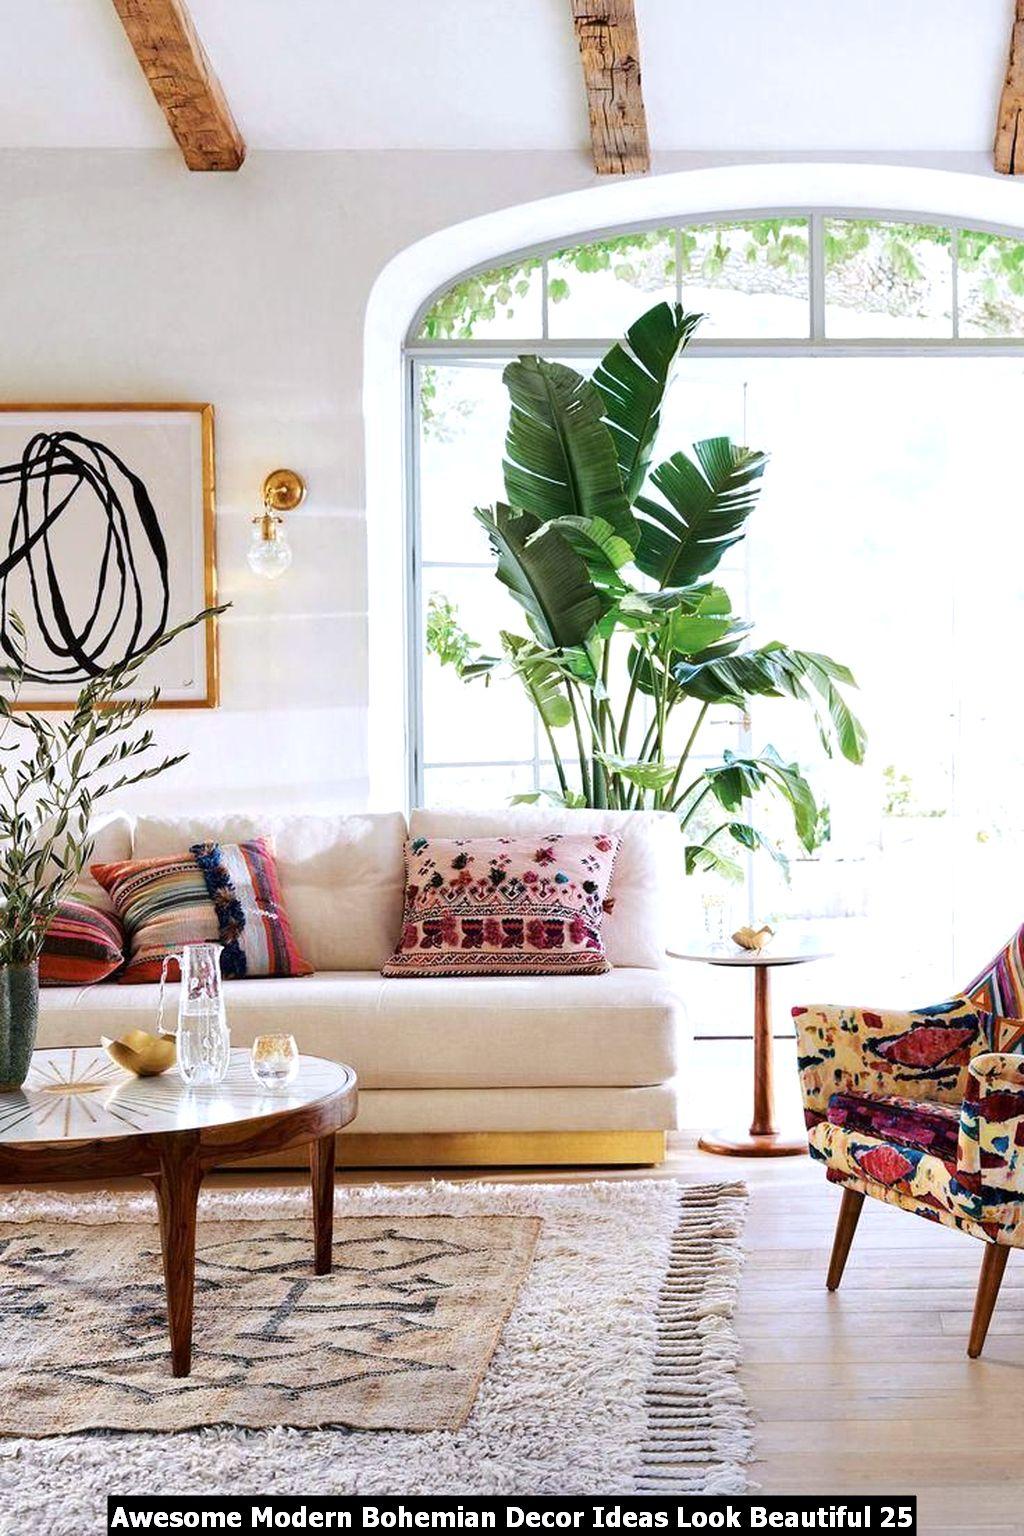 Awesome Modern Bohemian Decor Ideas Look Beautiful 25